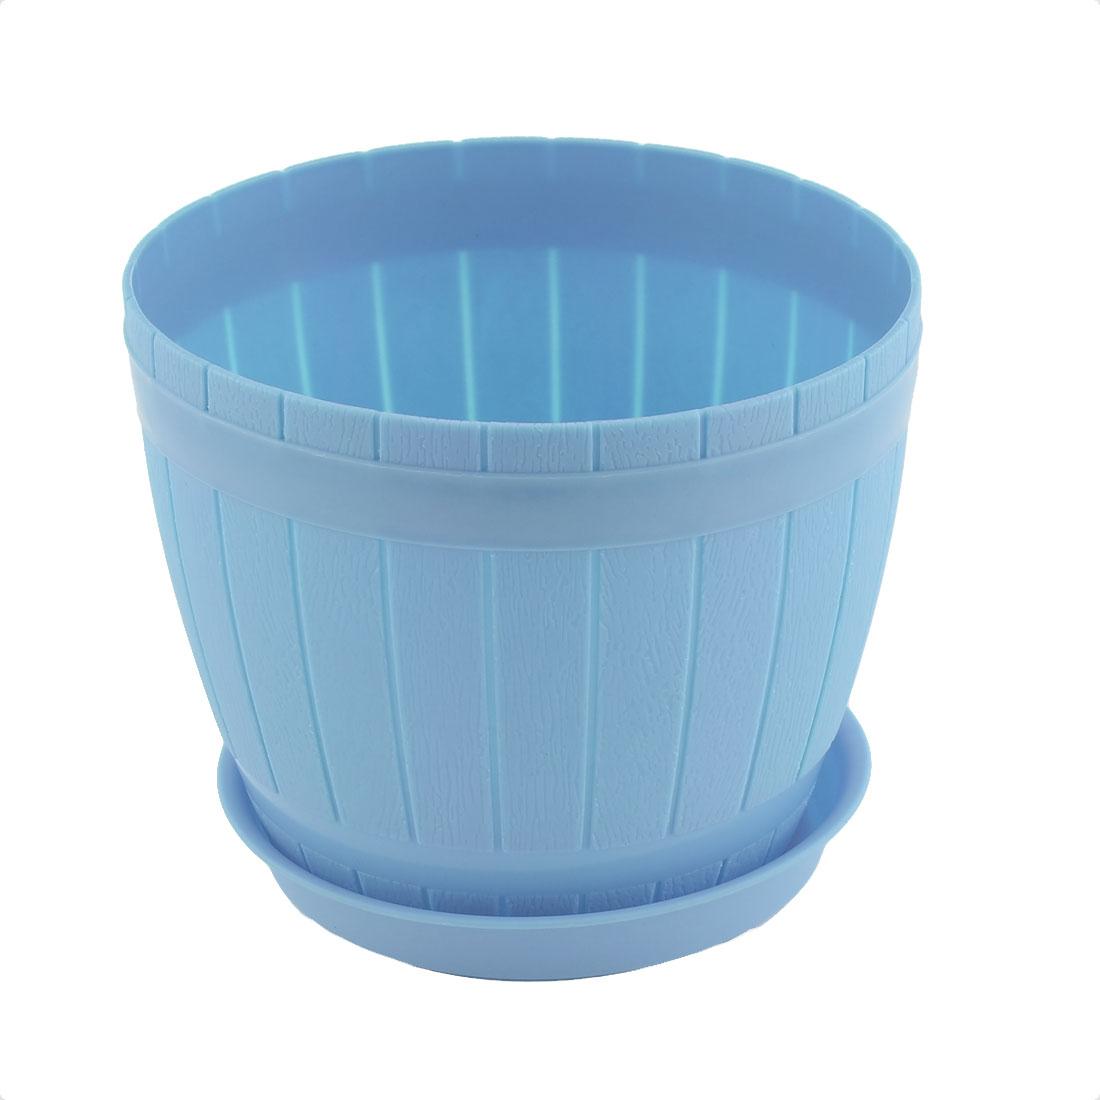 Home Windowsill Plastic Plant Flower Pot Planter Light Blue w Tray